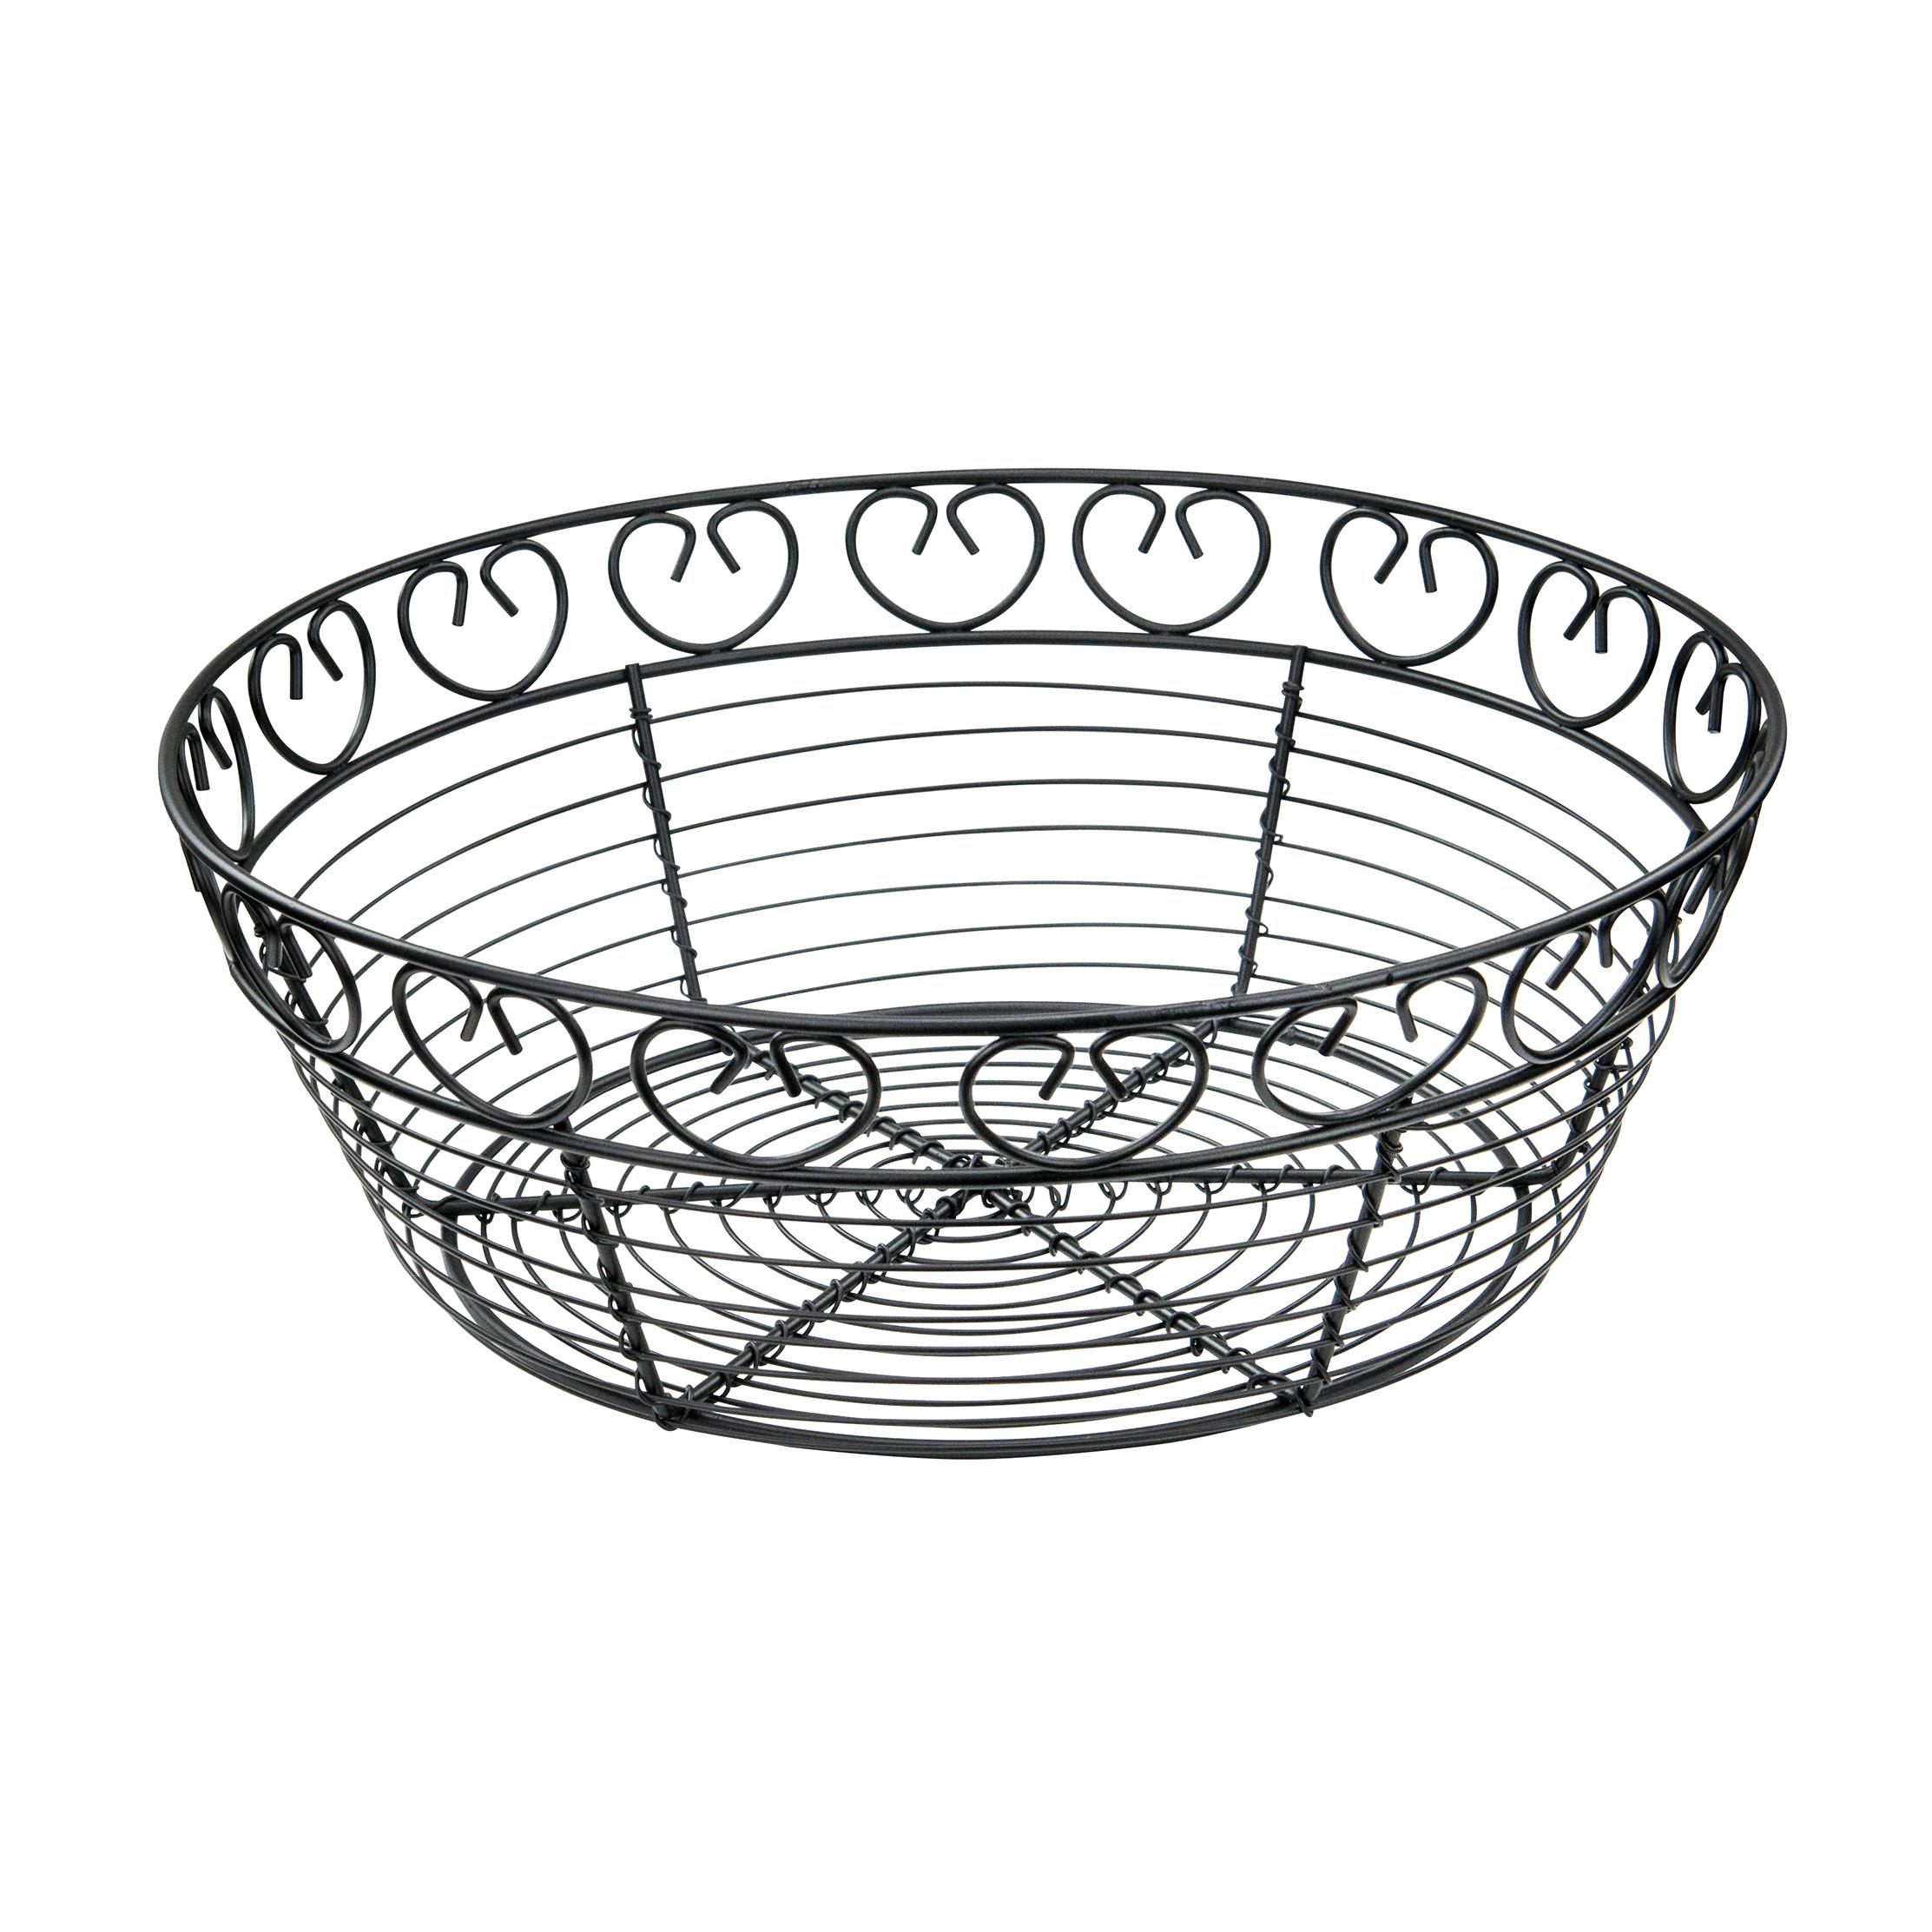 Winco WBKG-10R basket, tabletop, metal